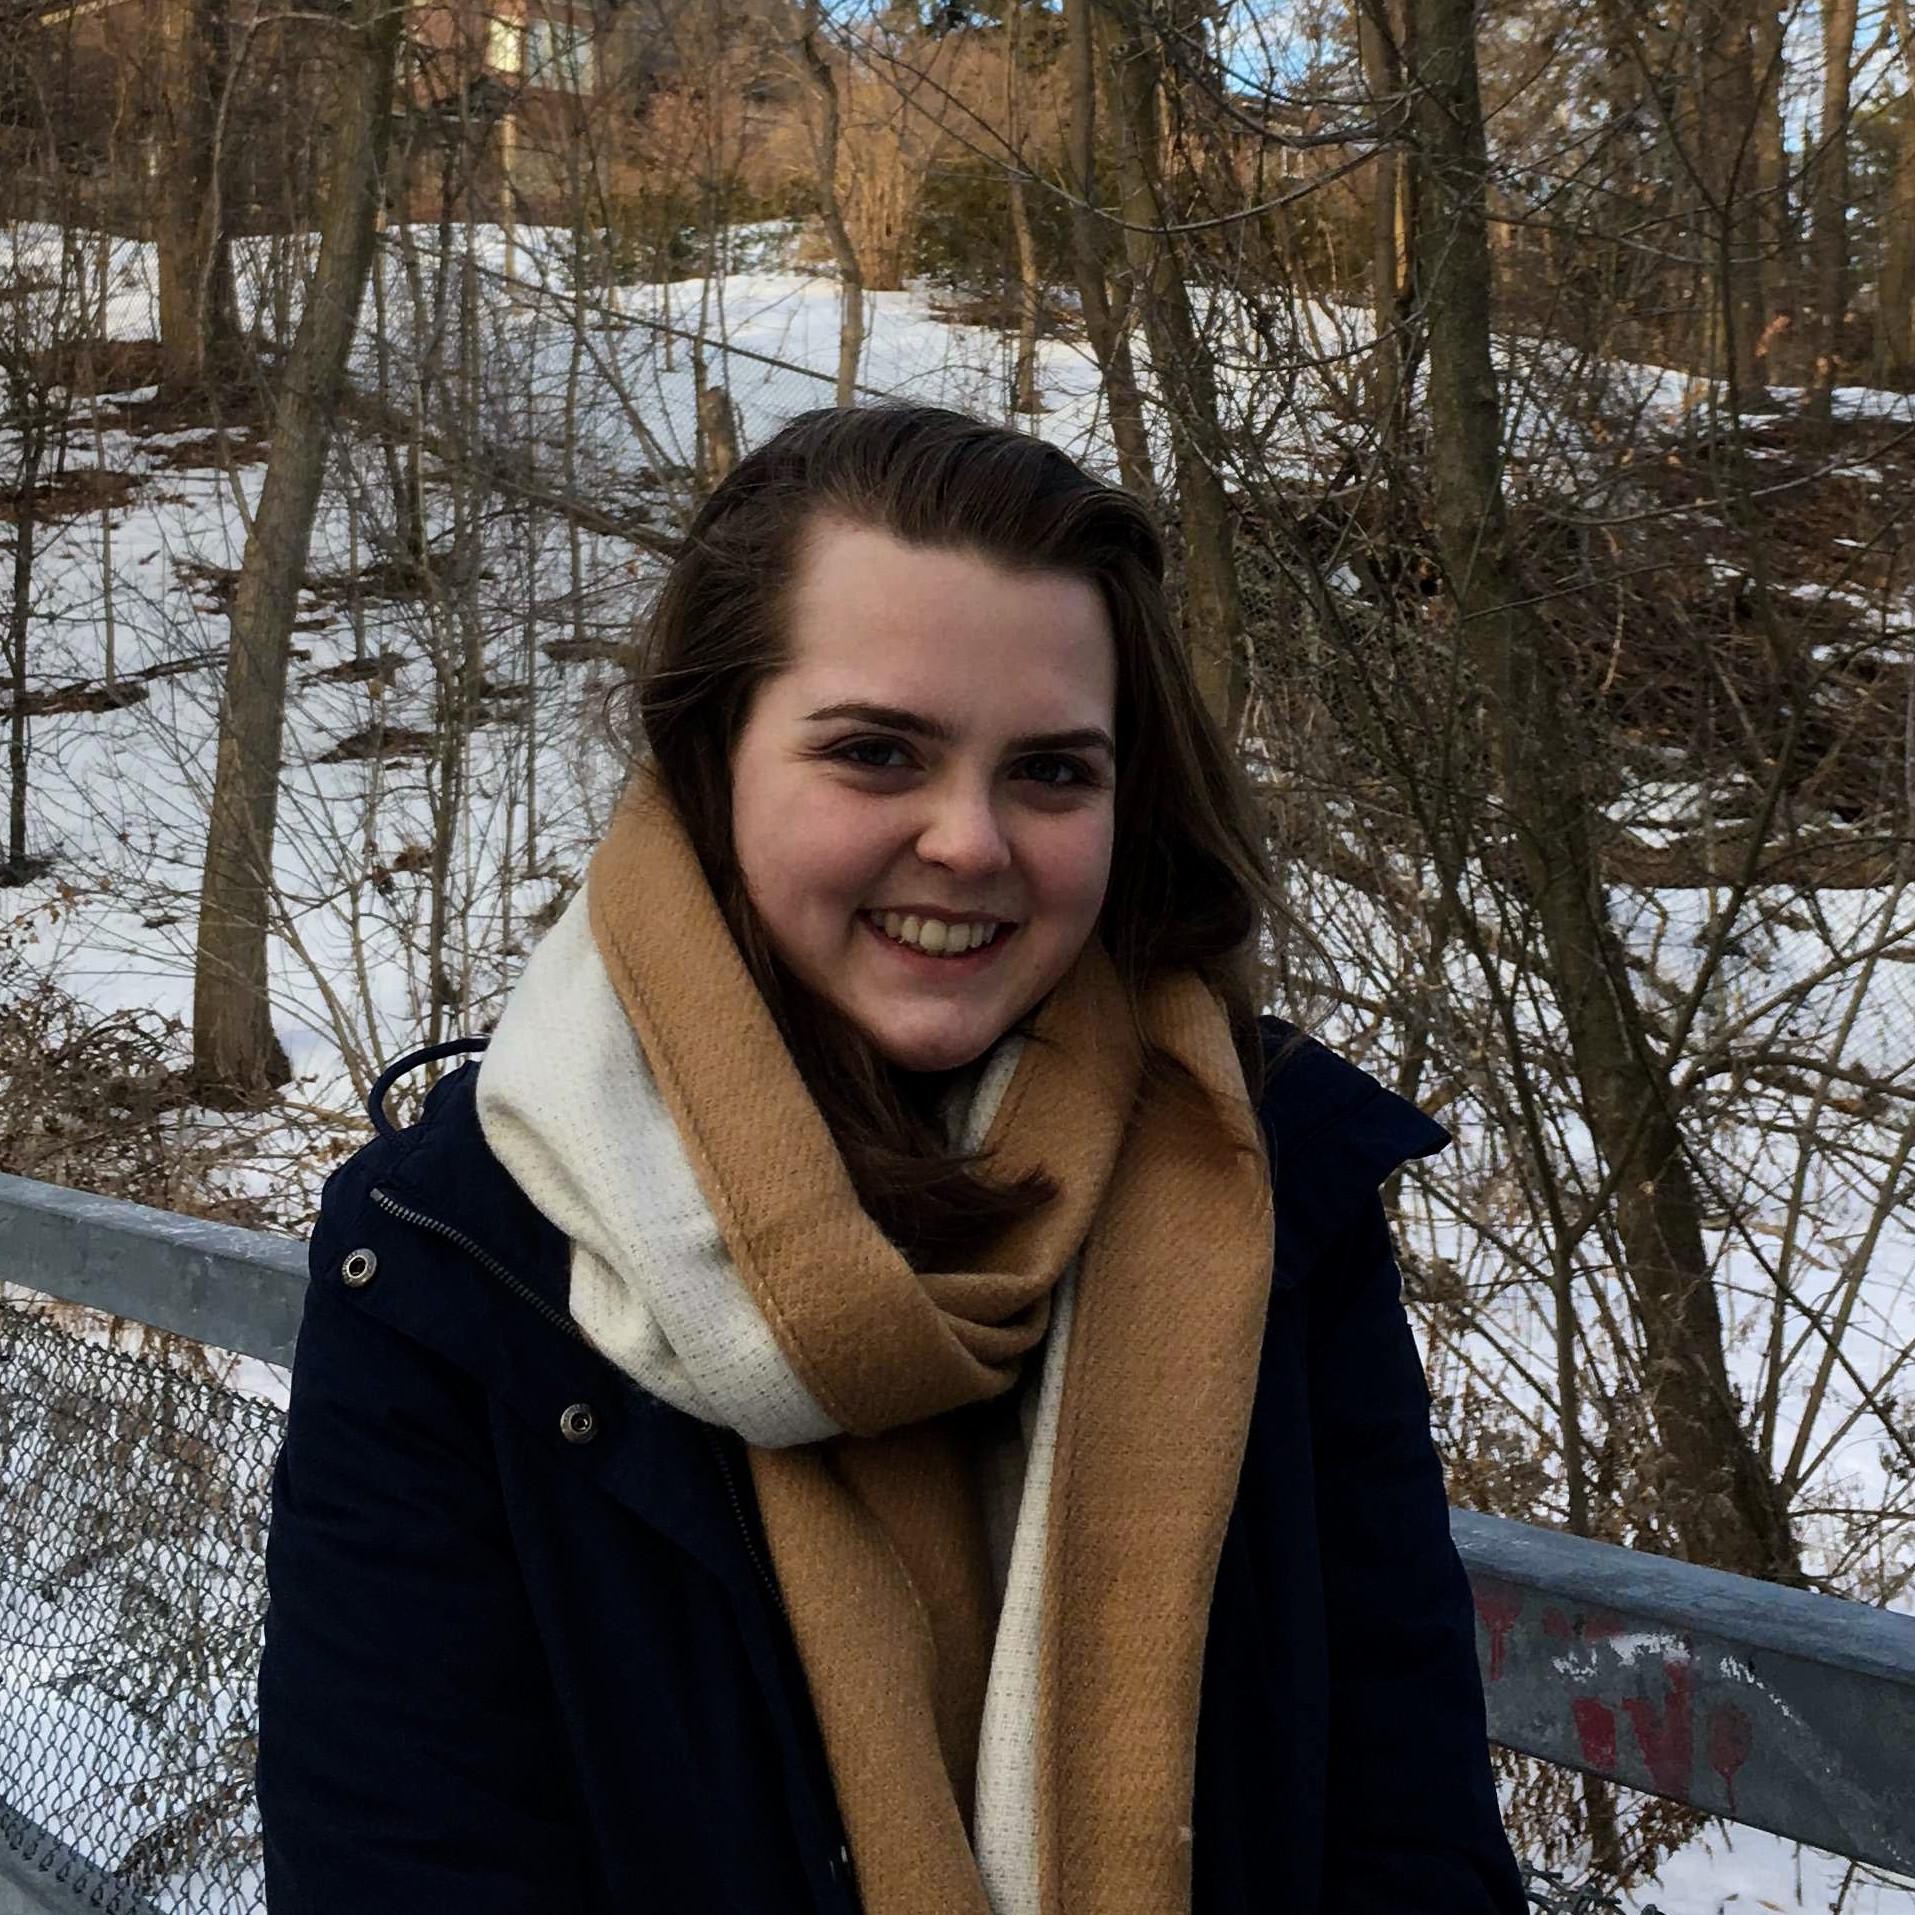 Sarah McGillivray   M.Sc. student, Integrated Program in Neuroscience, McGill.